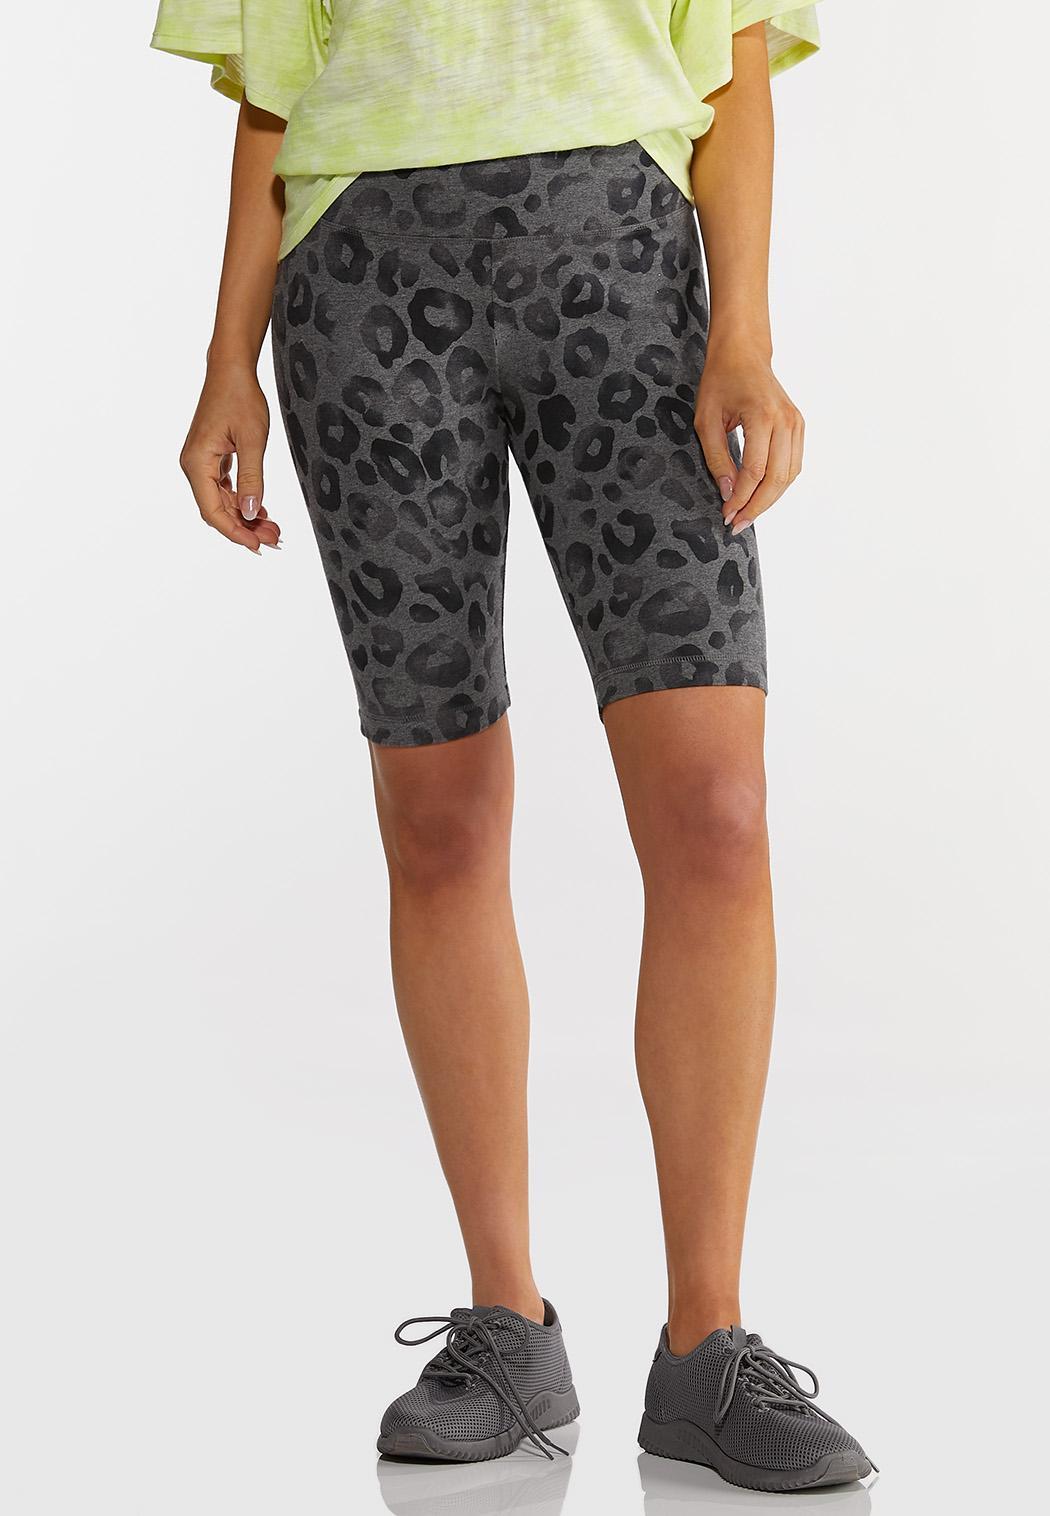 Leopard Bike Shorts